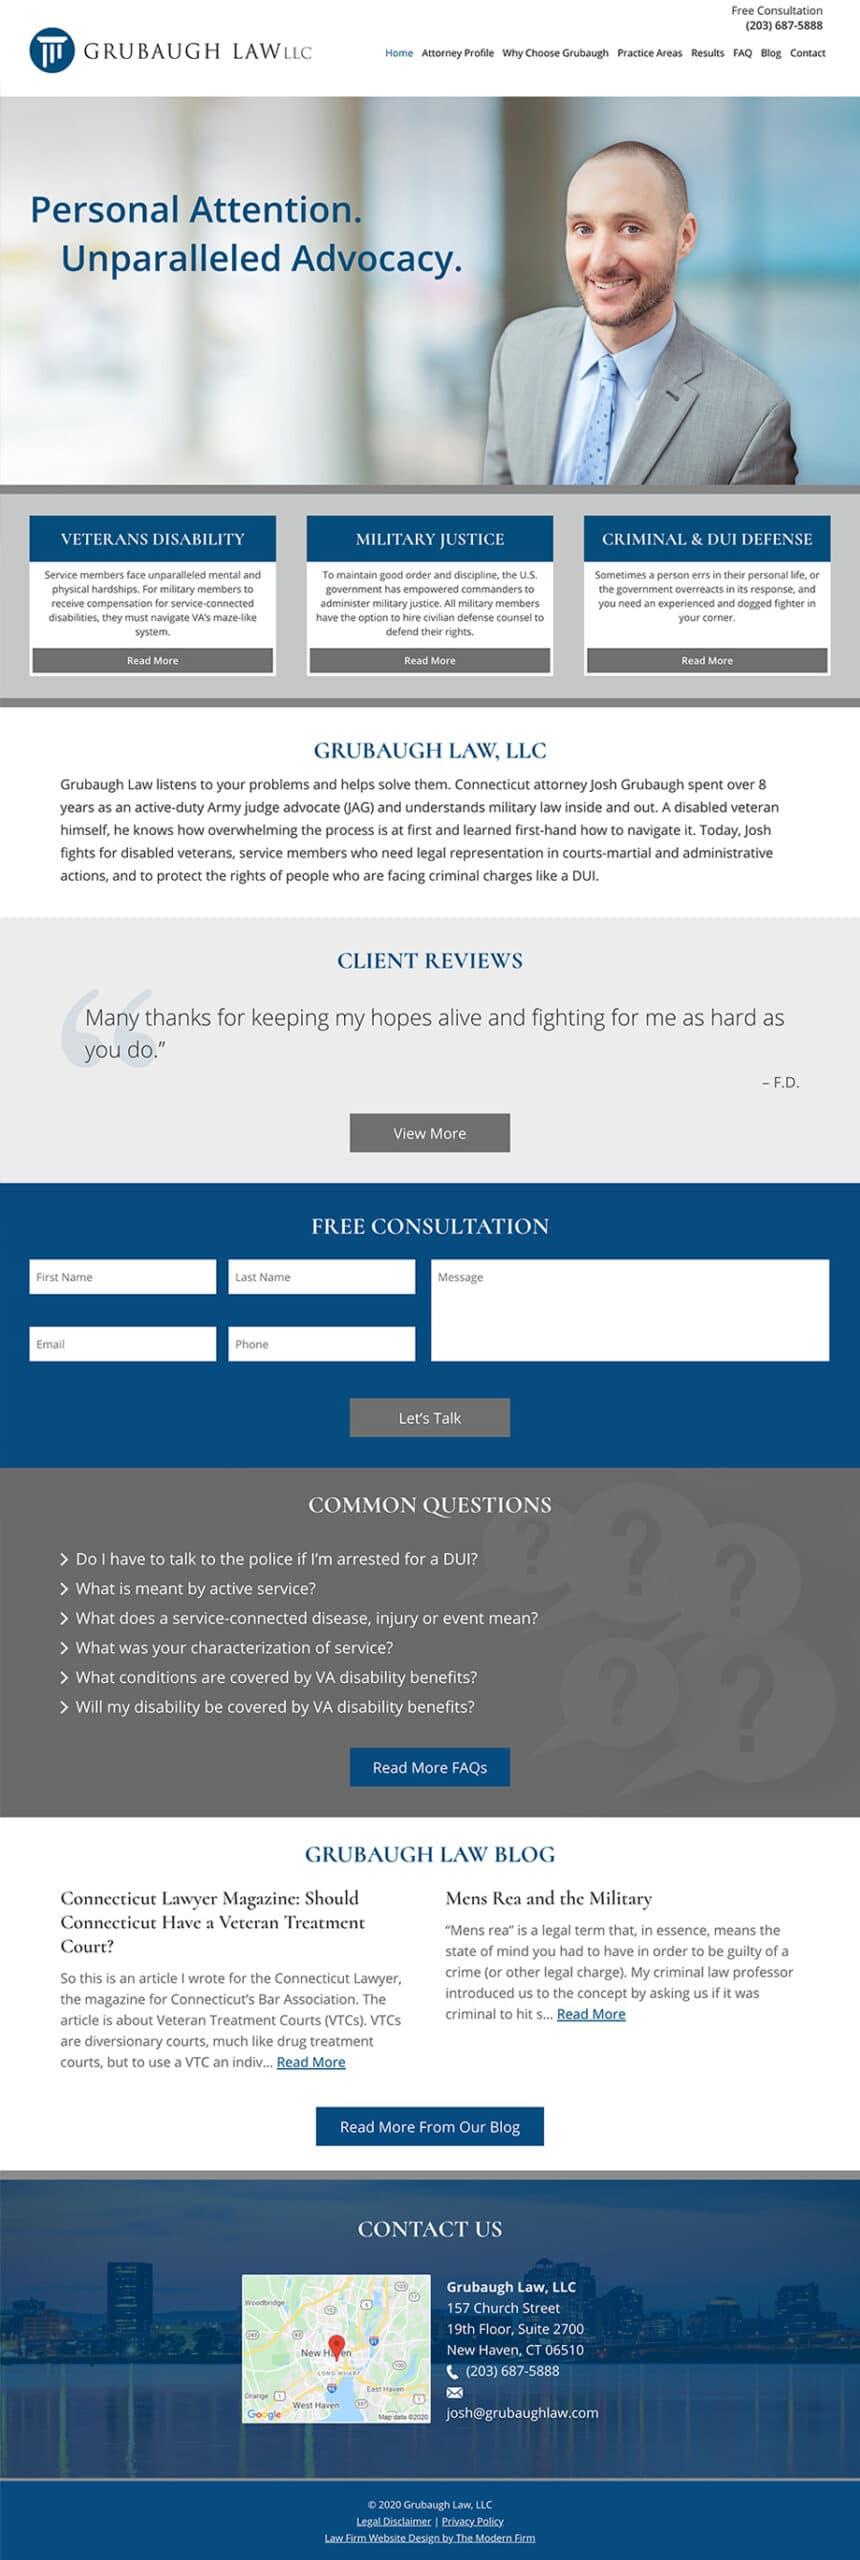 Law Firm Website Design for Grubaugh Law, LLC